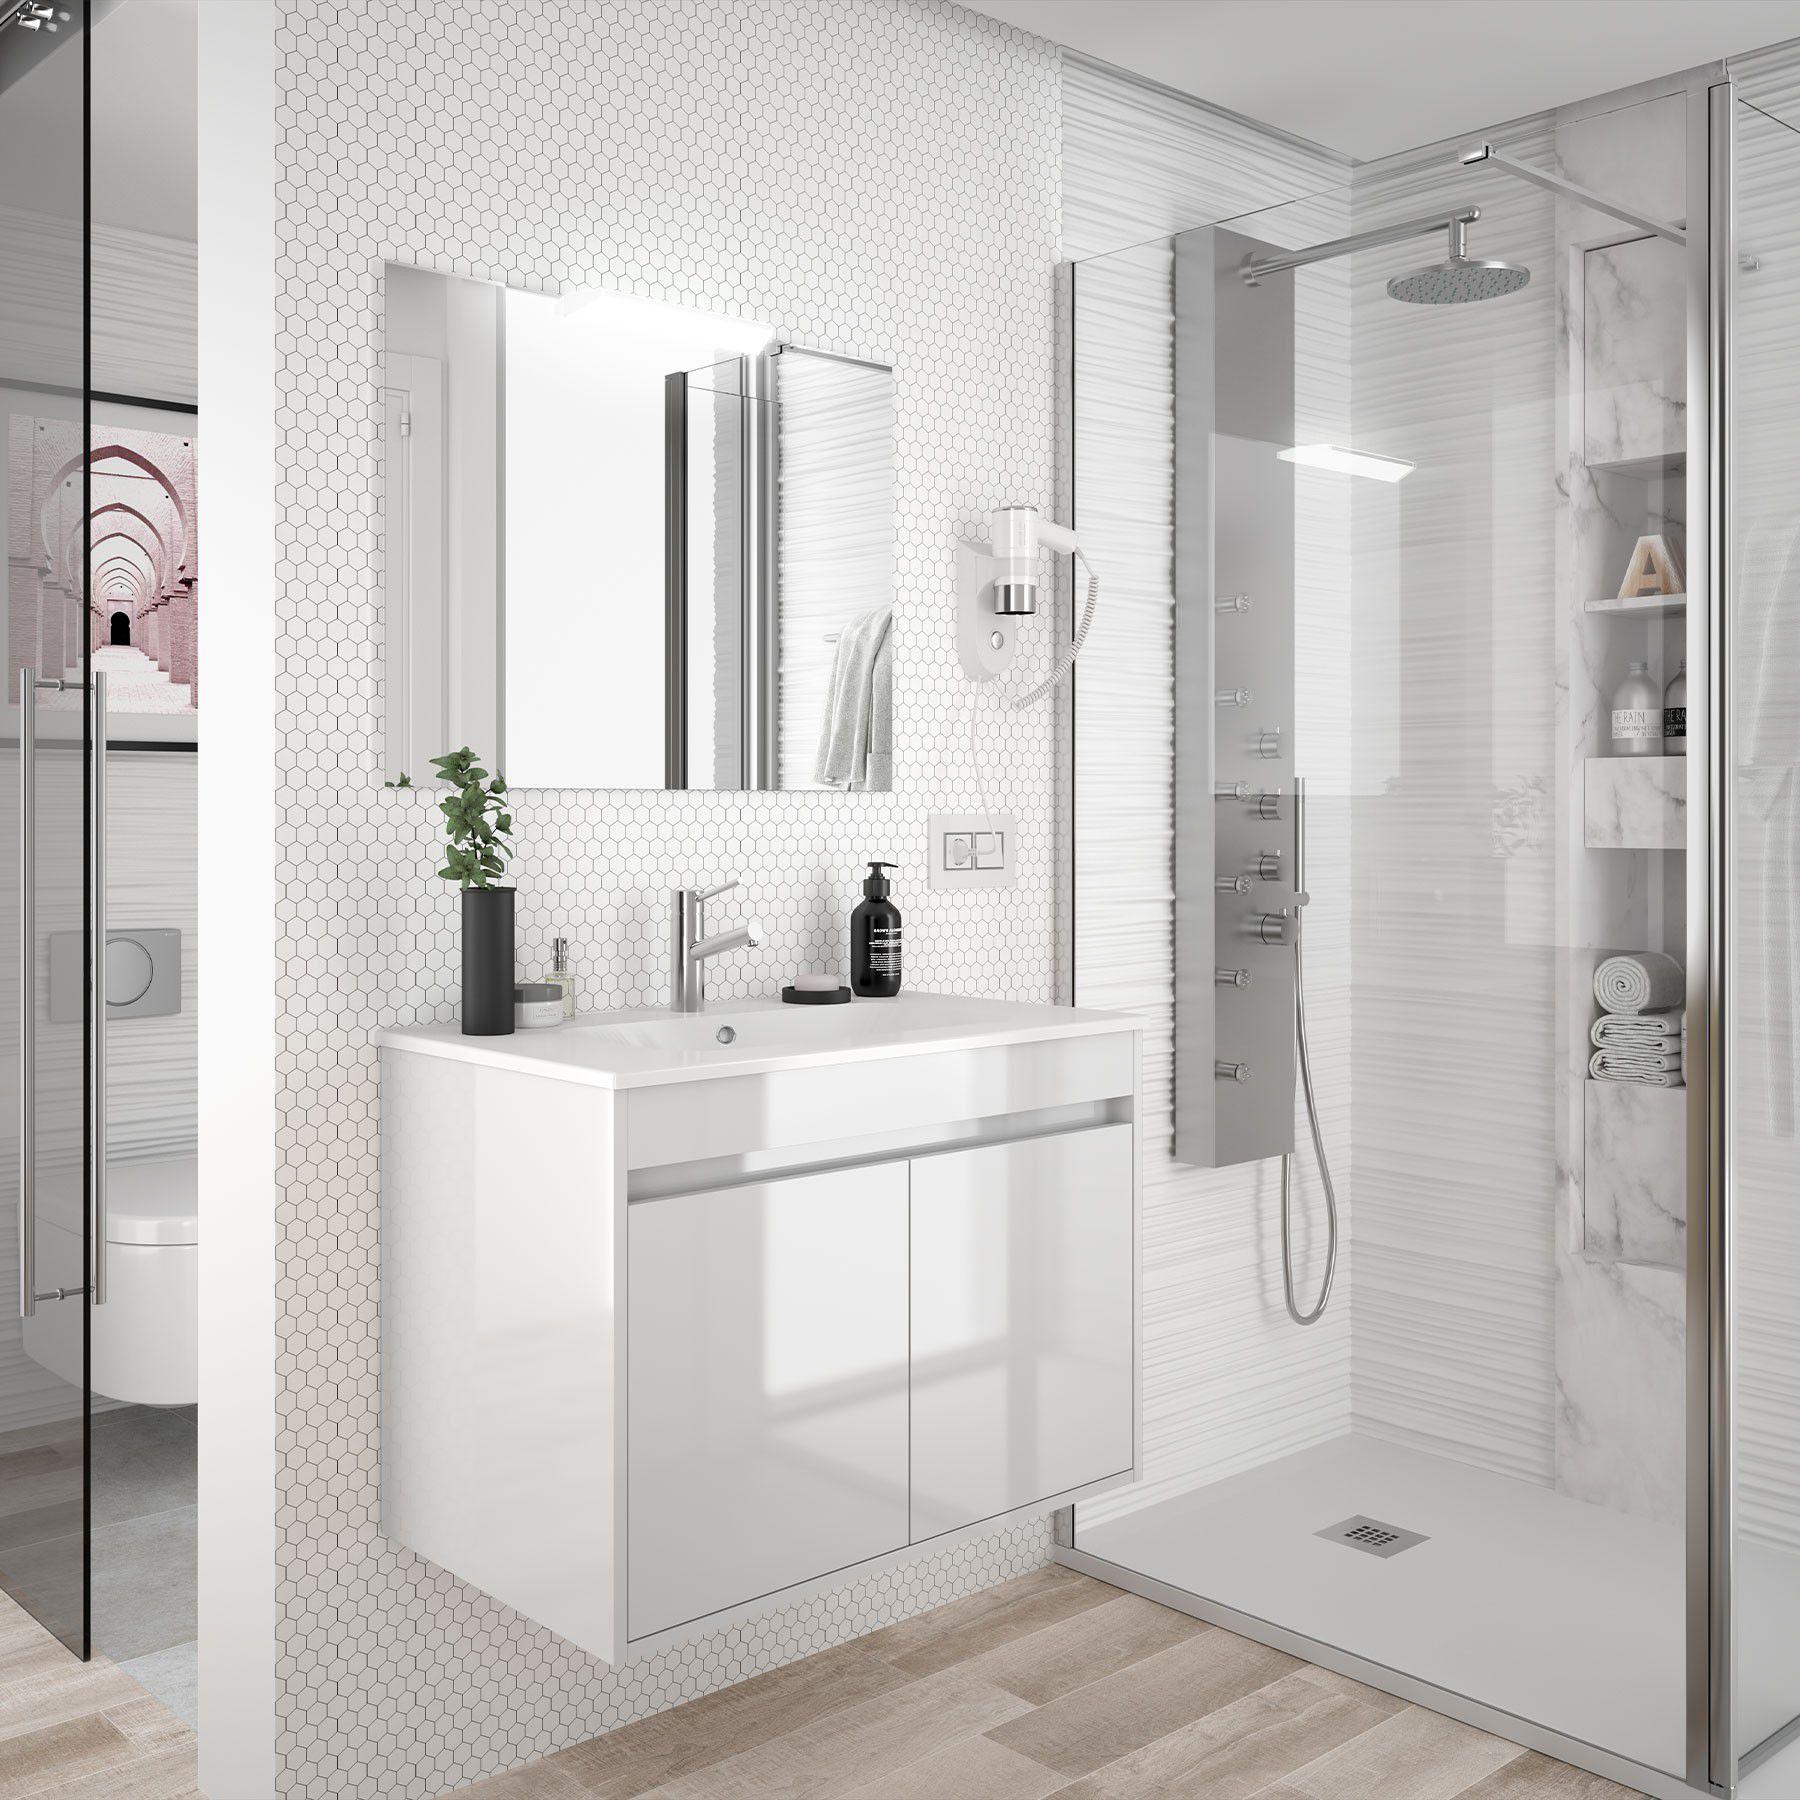 Ensemble Salgar Noja 70 Cm 2 Portes Blanc Brillant Meuble Vasque Miroir En Option